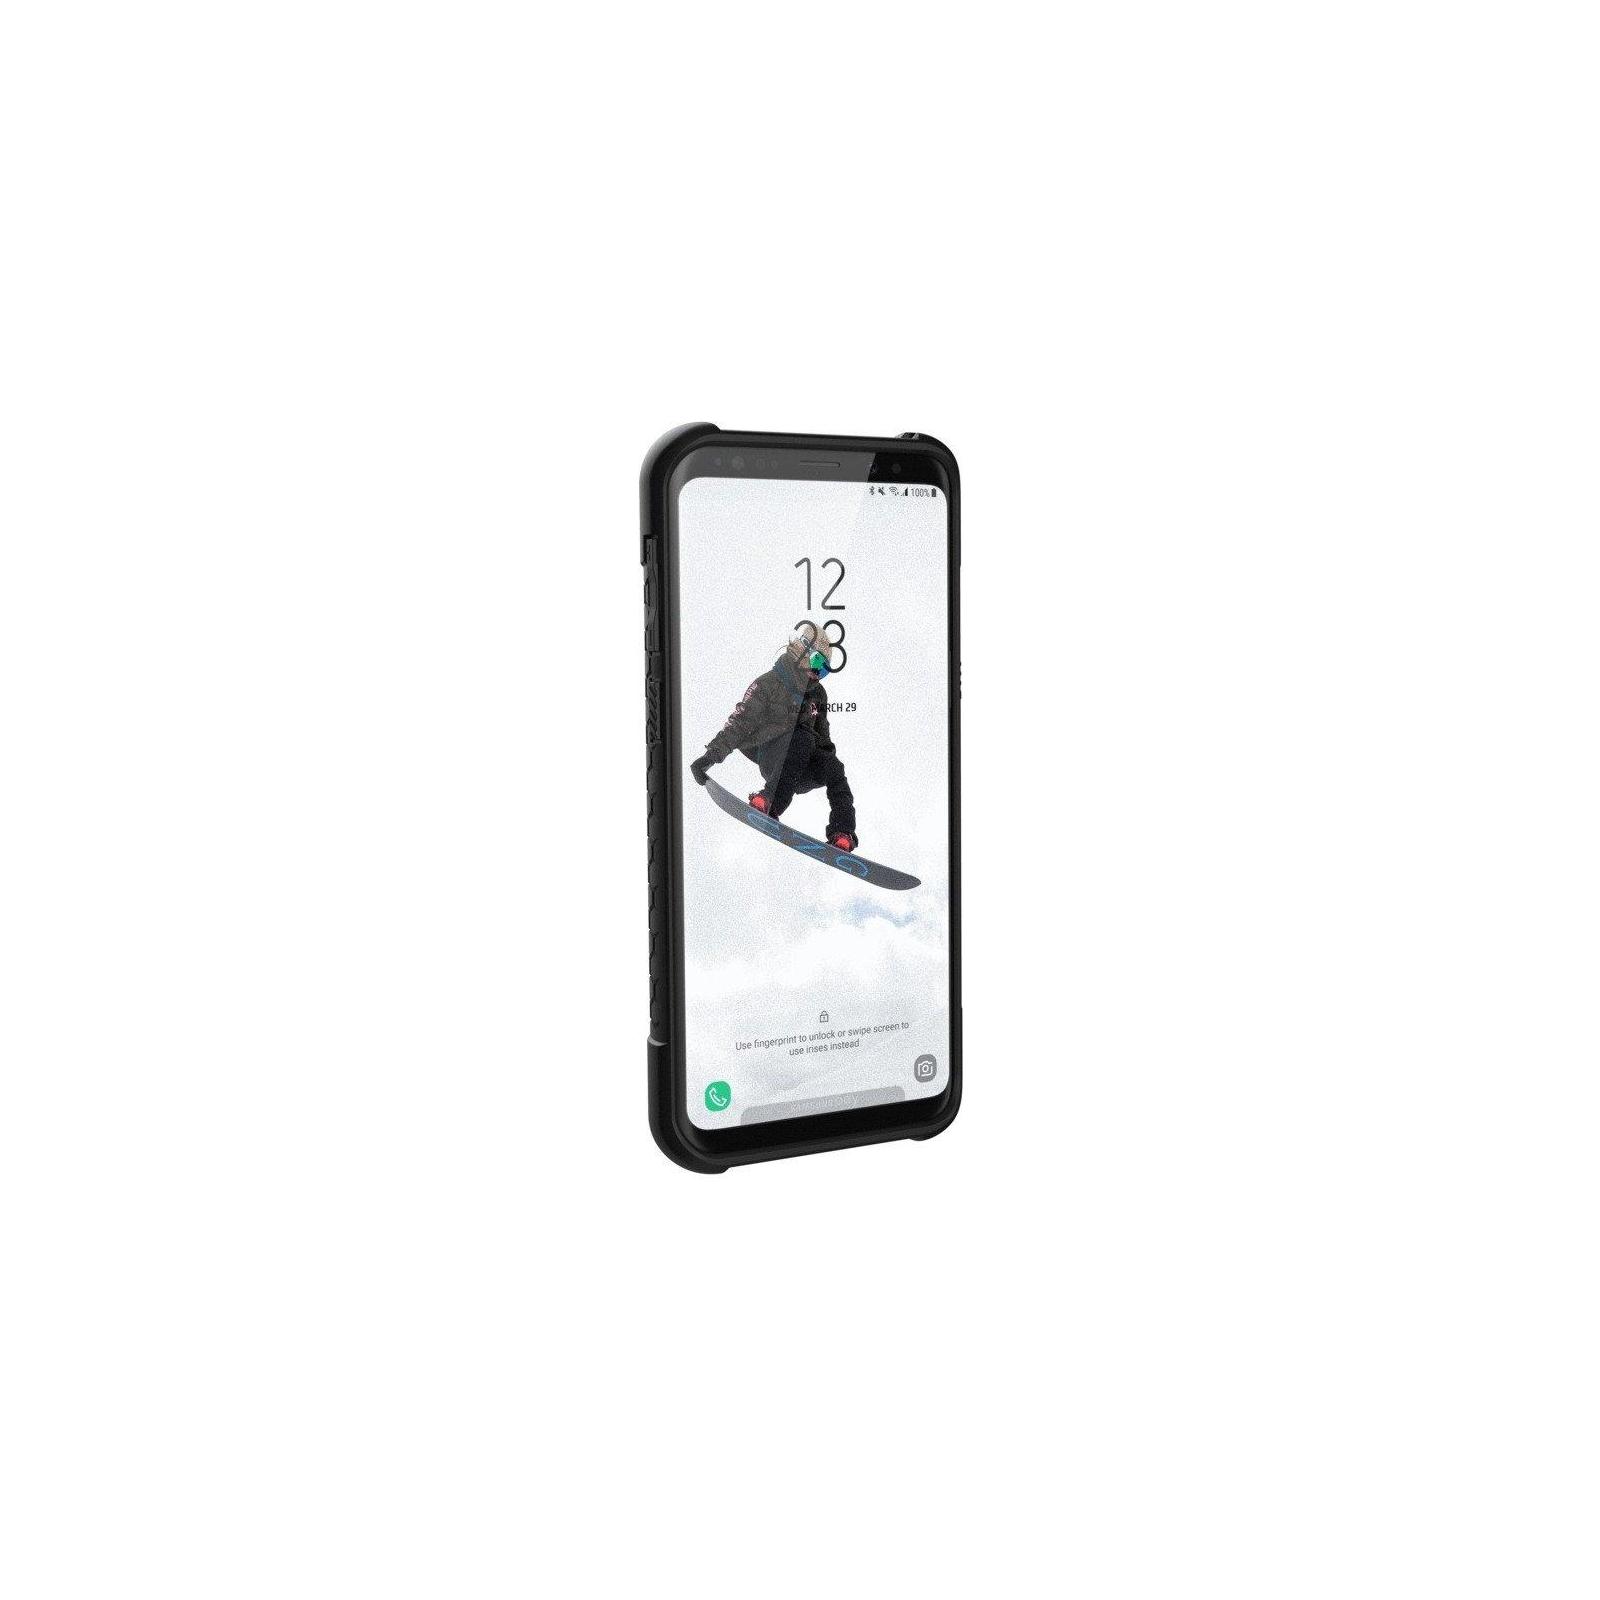 Чехол для моб. телефона Urban Armor Gear Galaxy S9 Monarch Crimson (GLXS9-M-CR) изображение 5